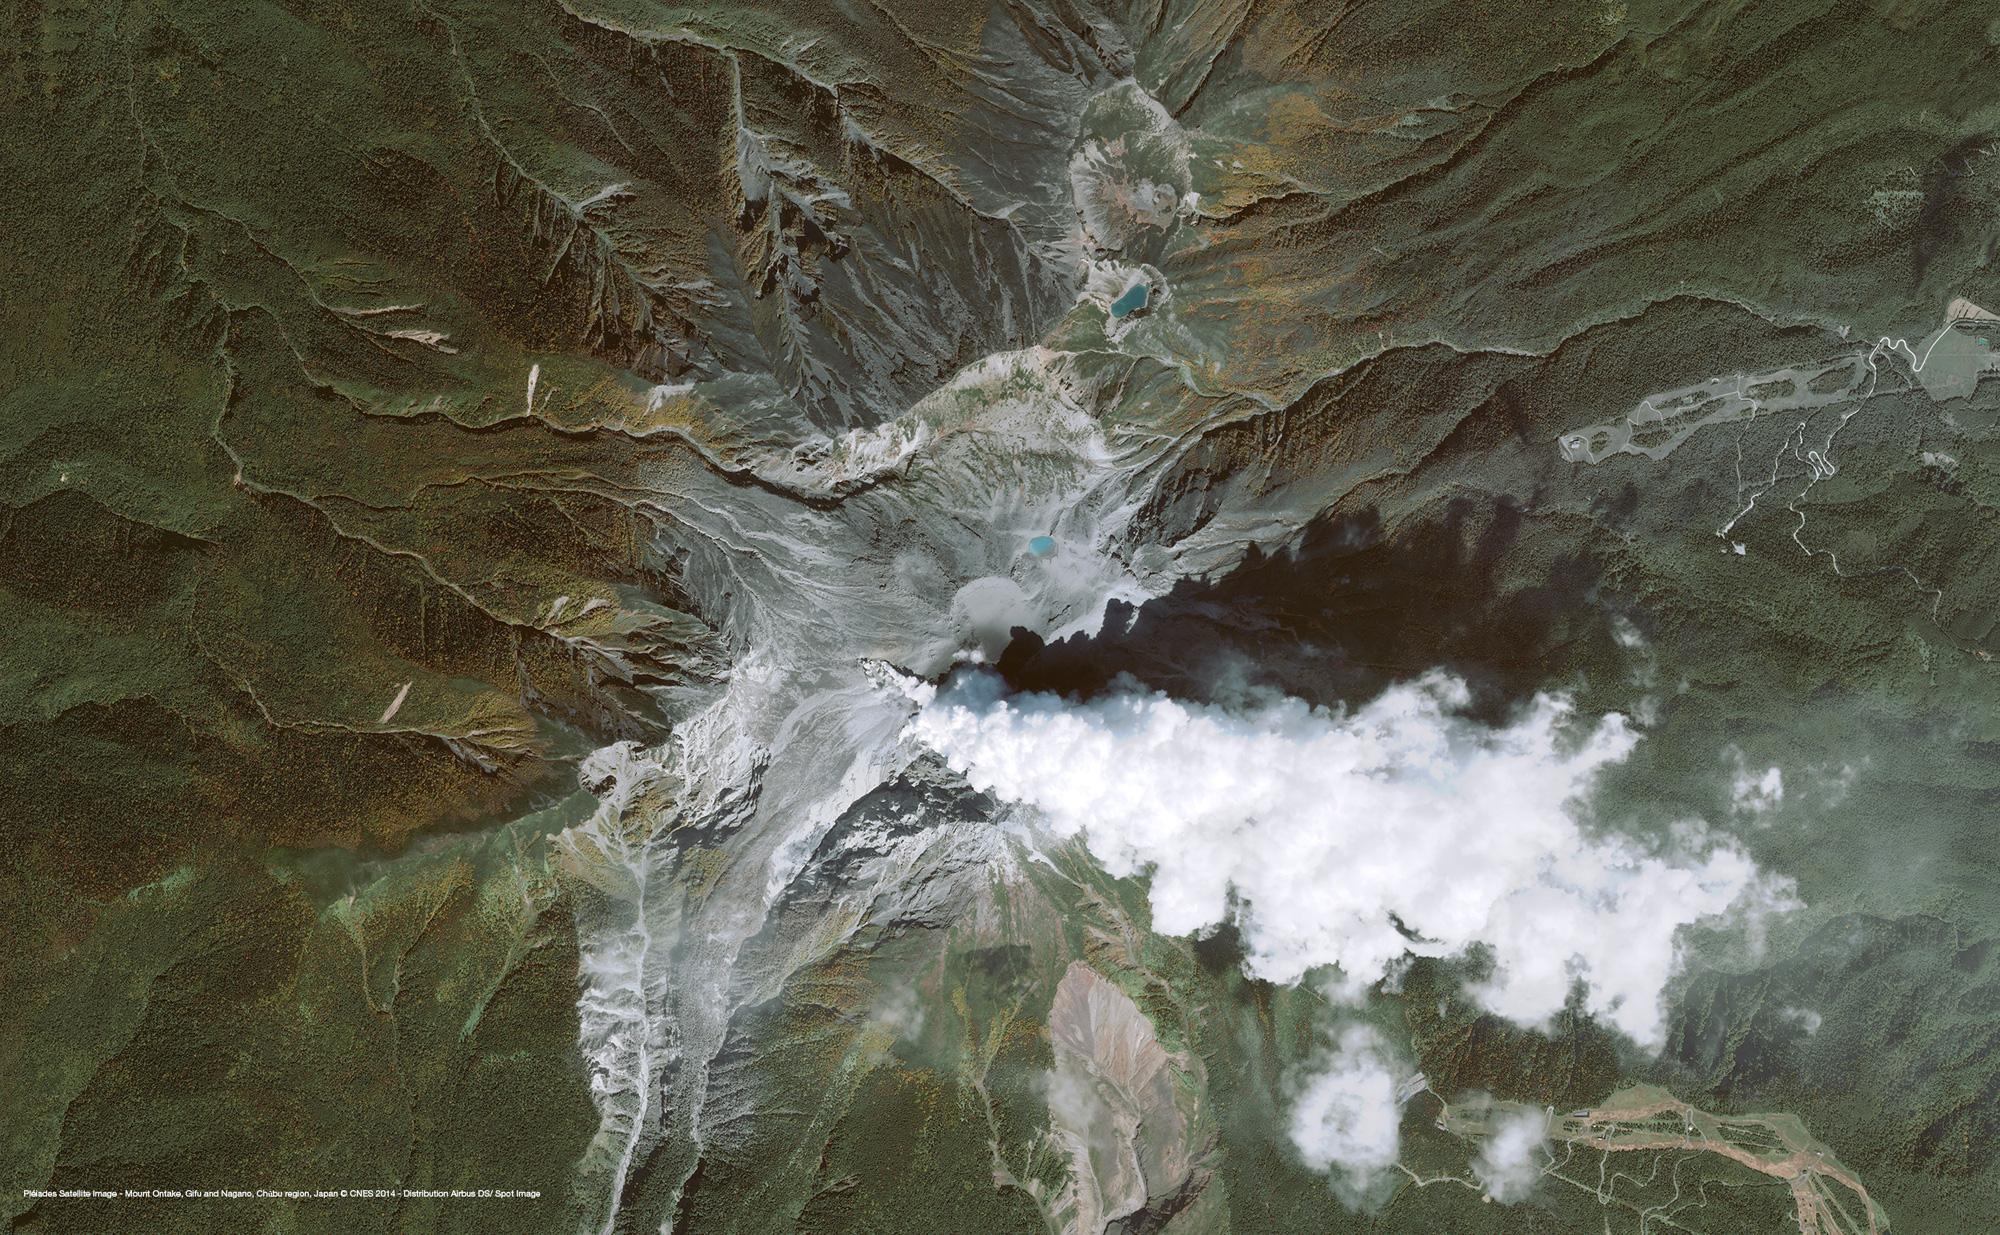 r34358_39_satellite_image_pleiades_mount-ontake_japan_20140930-2_2000.jpg